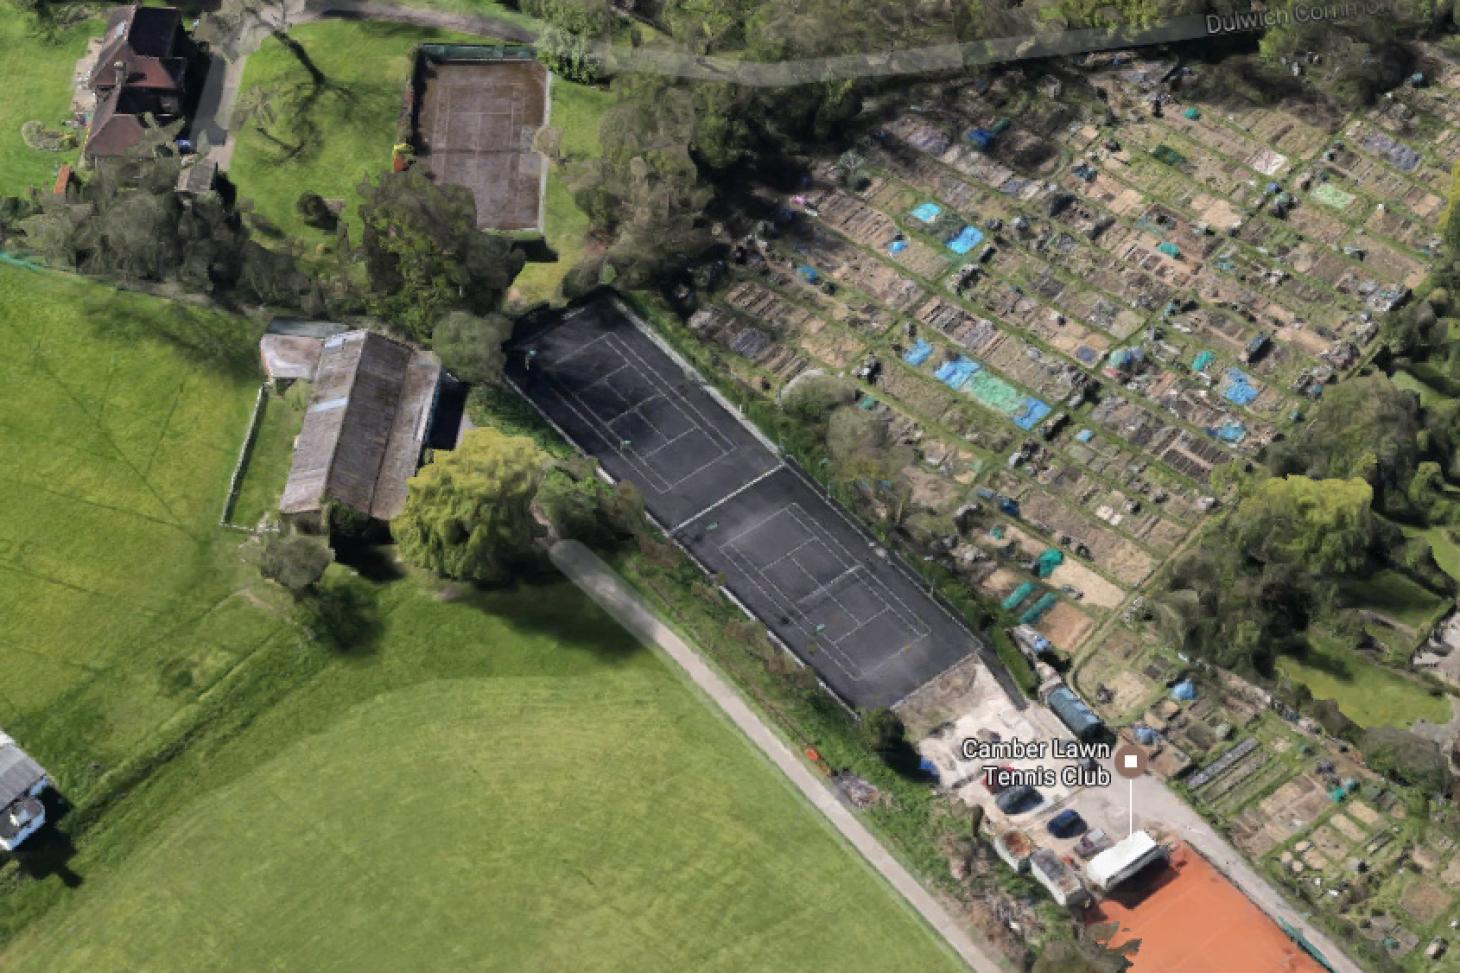 Camber Lawn Tennis Club Outdoor | Hard (macadam) tennis court